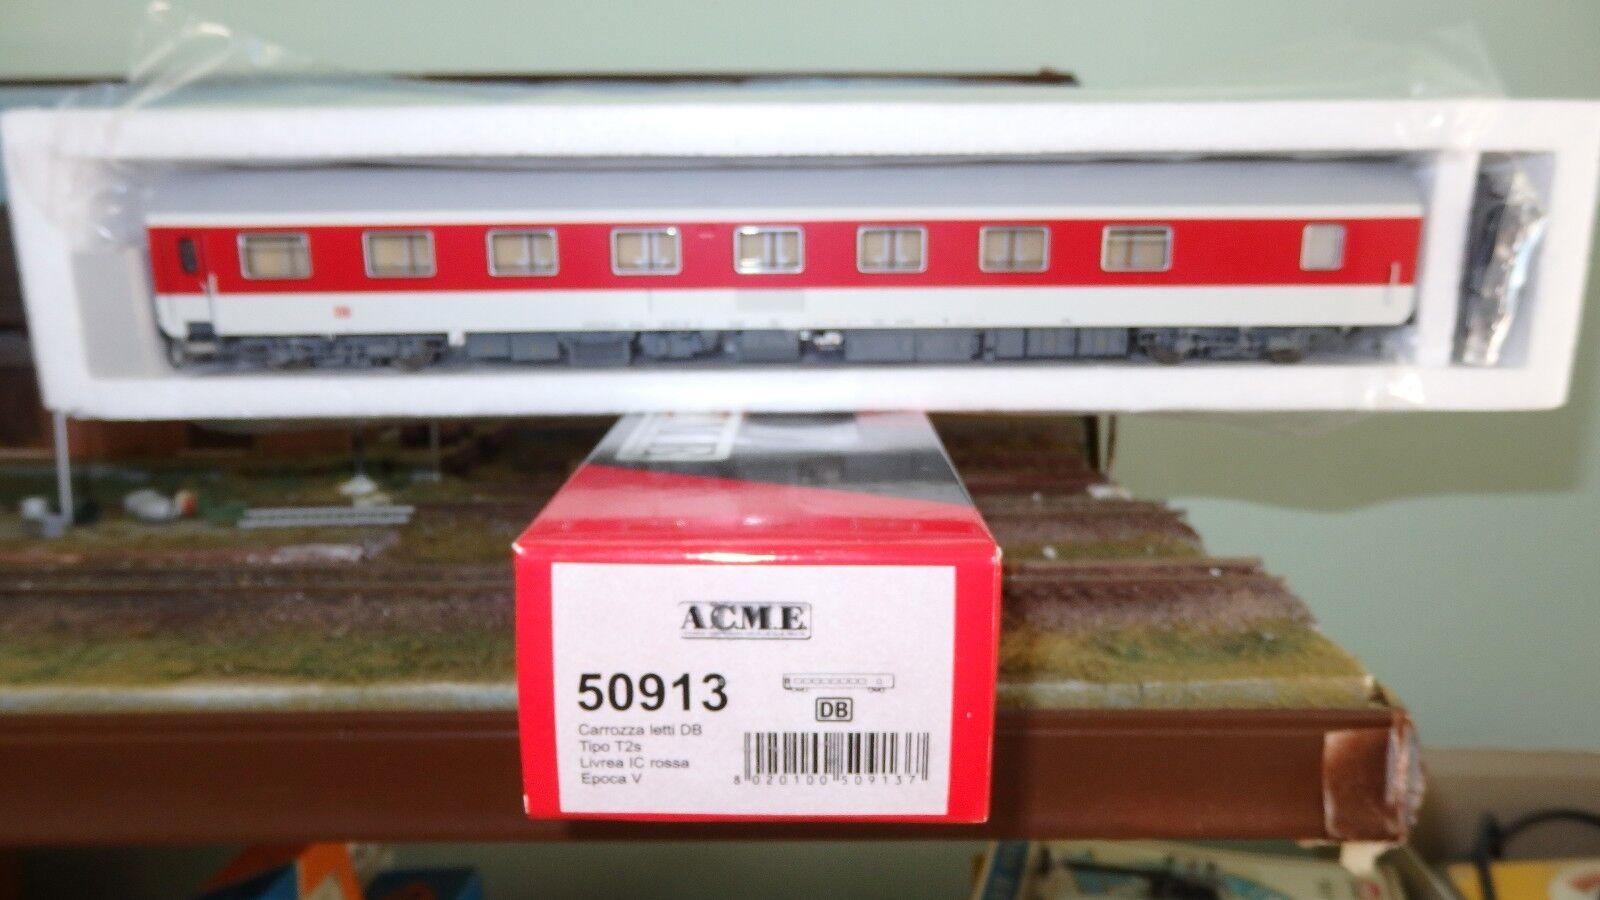 Acme 50913 DB Ag Wlabsm 166.0 Librea Rojo Tráfico   blancoo Techo gris Tipo T2s